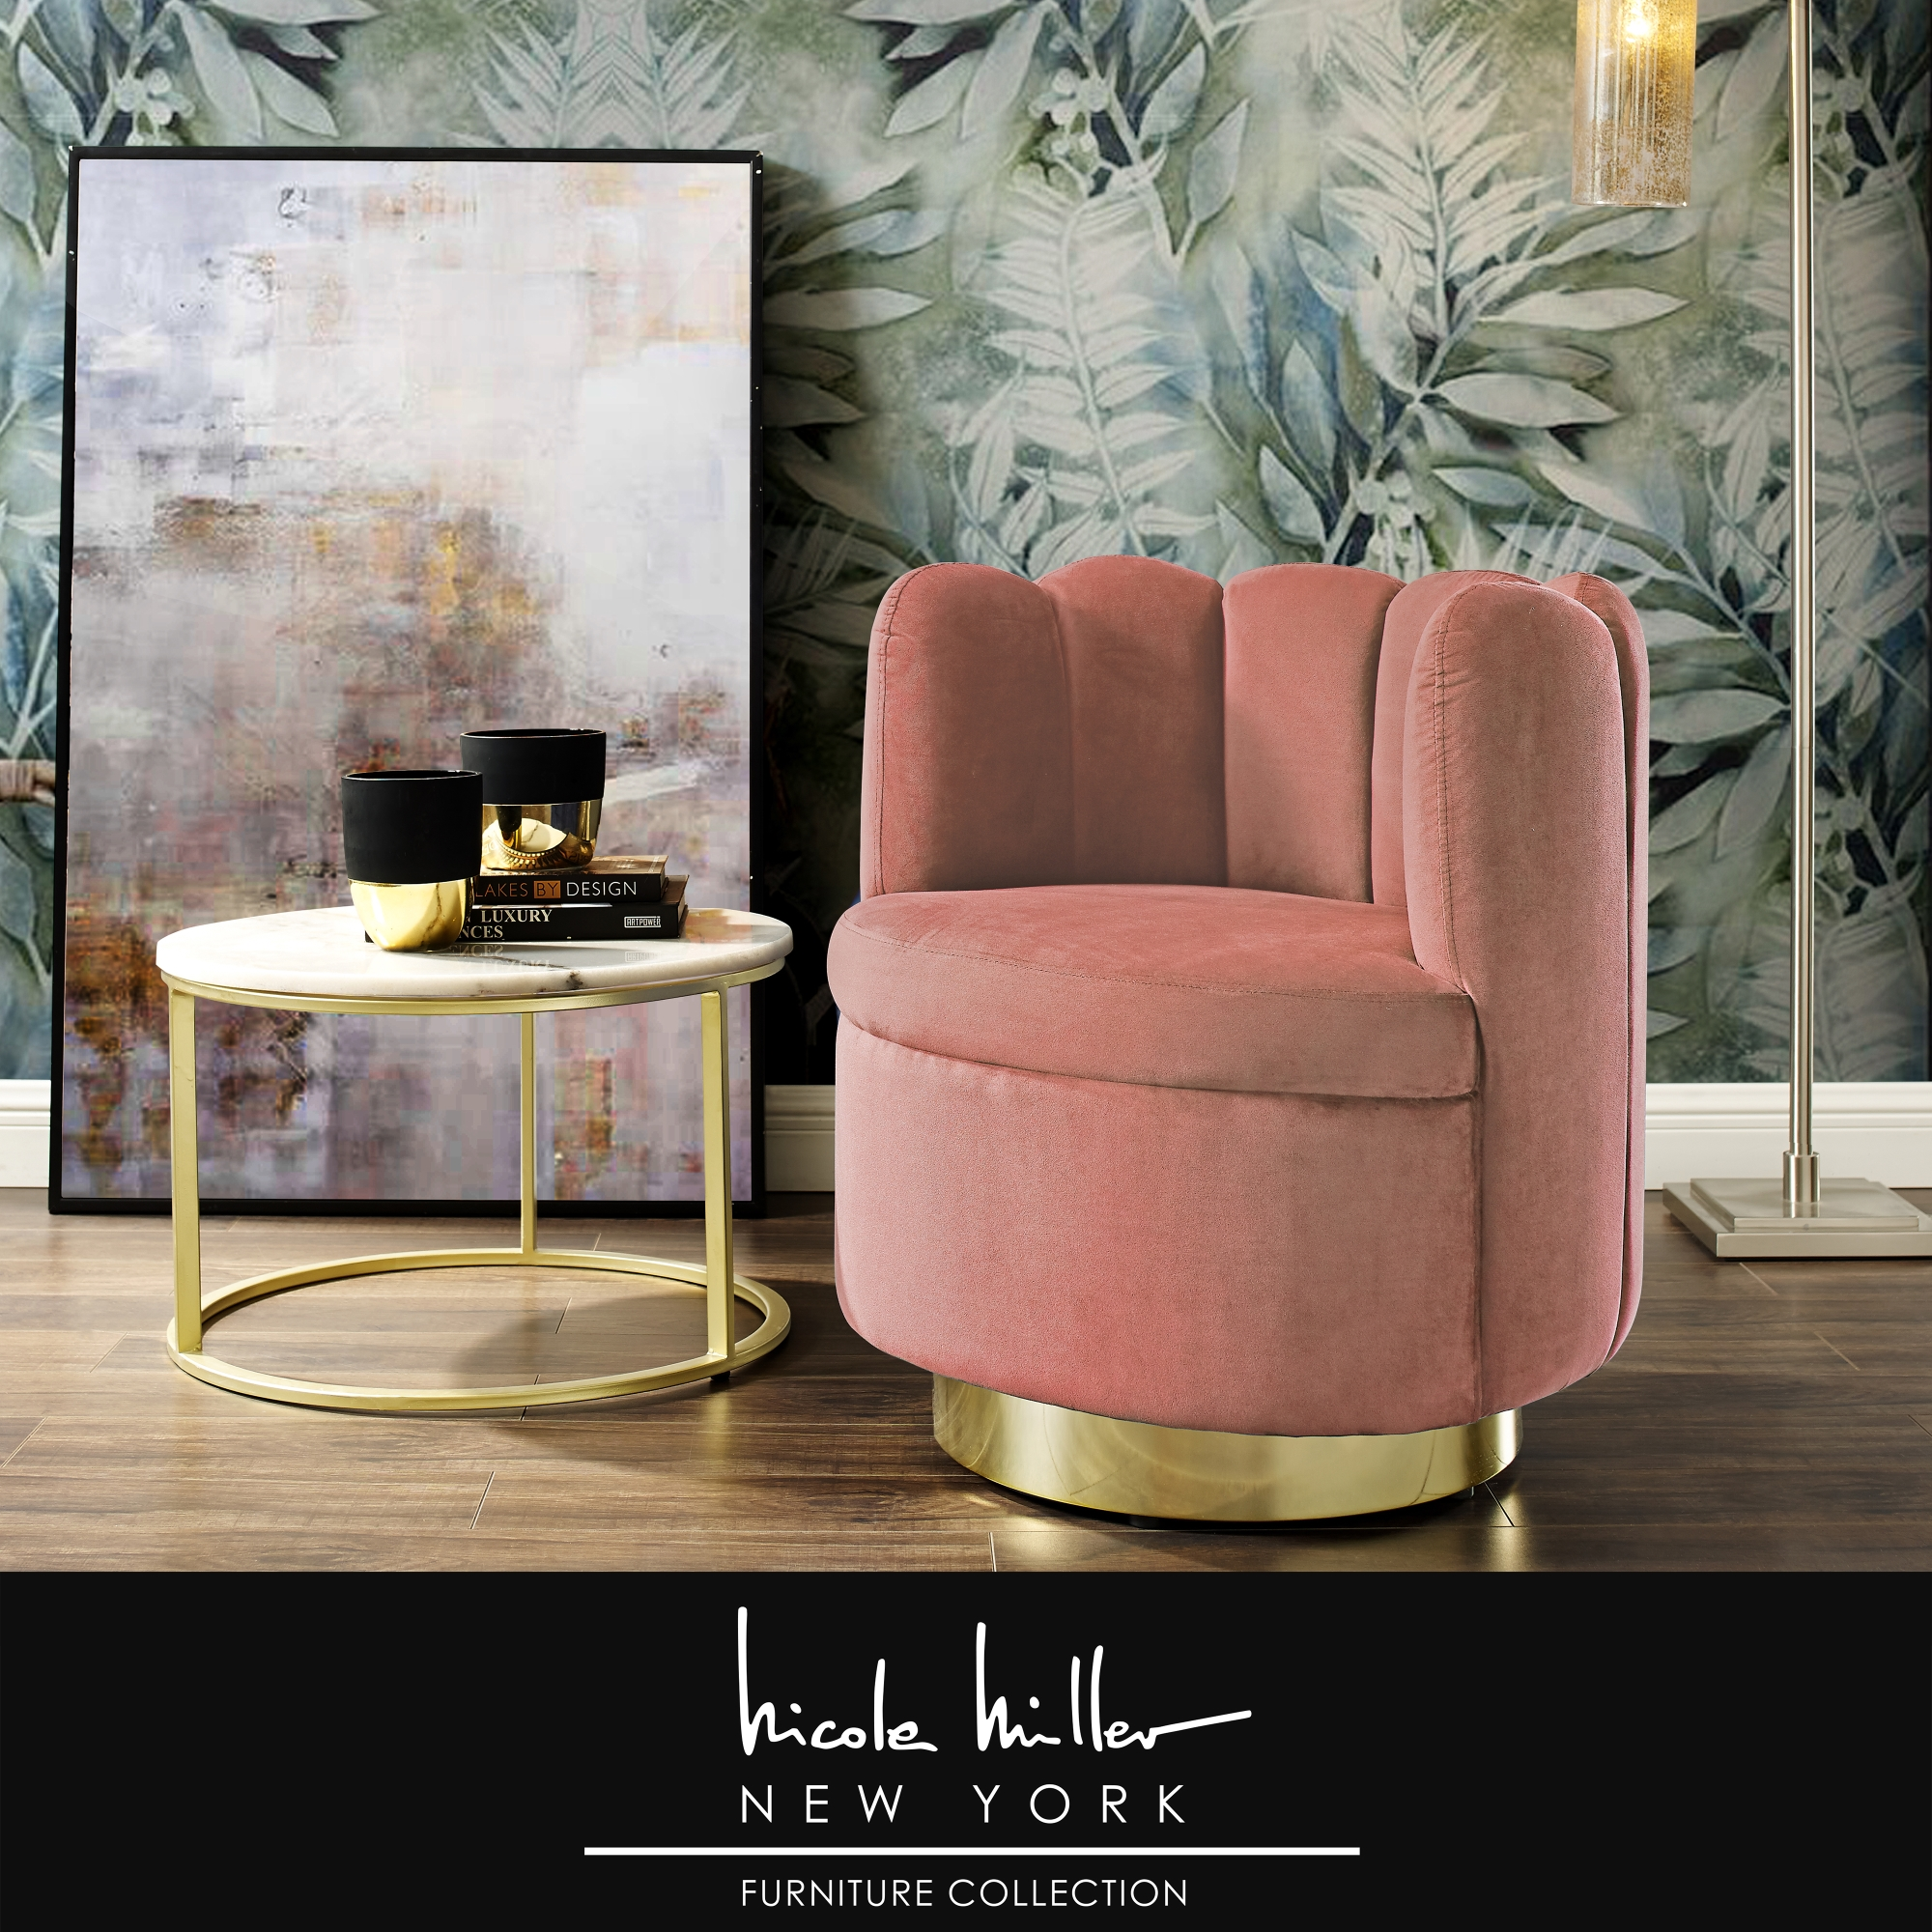 Nicole Miller Blush/Gold Velvet Accent Chair Upholstered Armless Channel Tufted Back, Stainless Steel Base